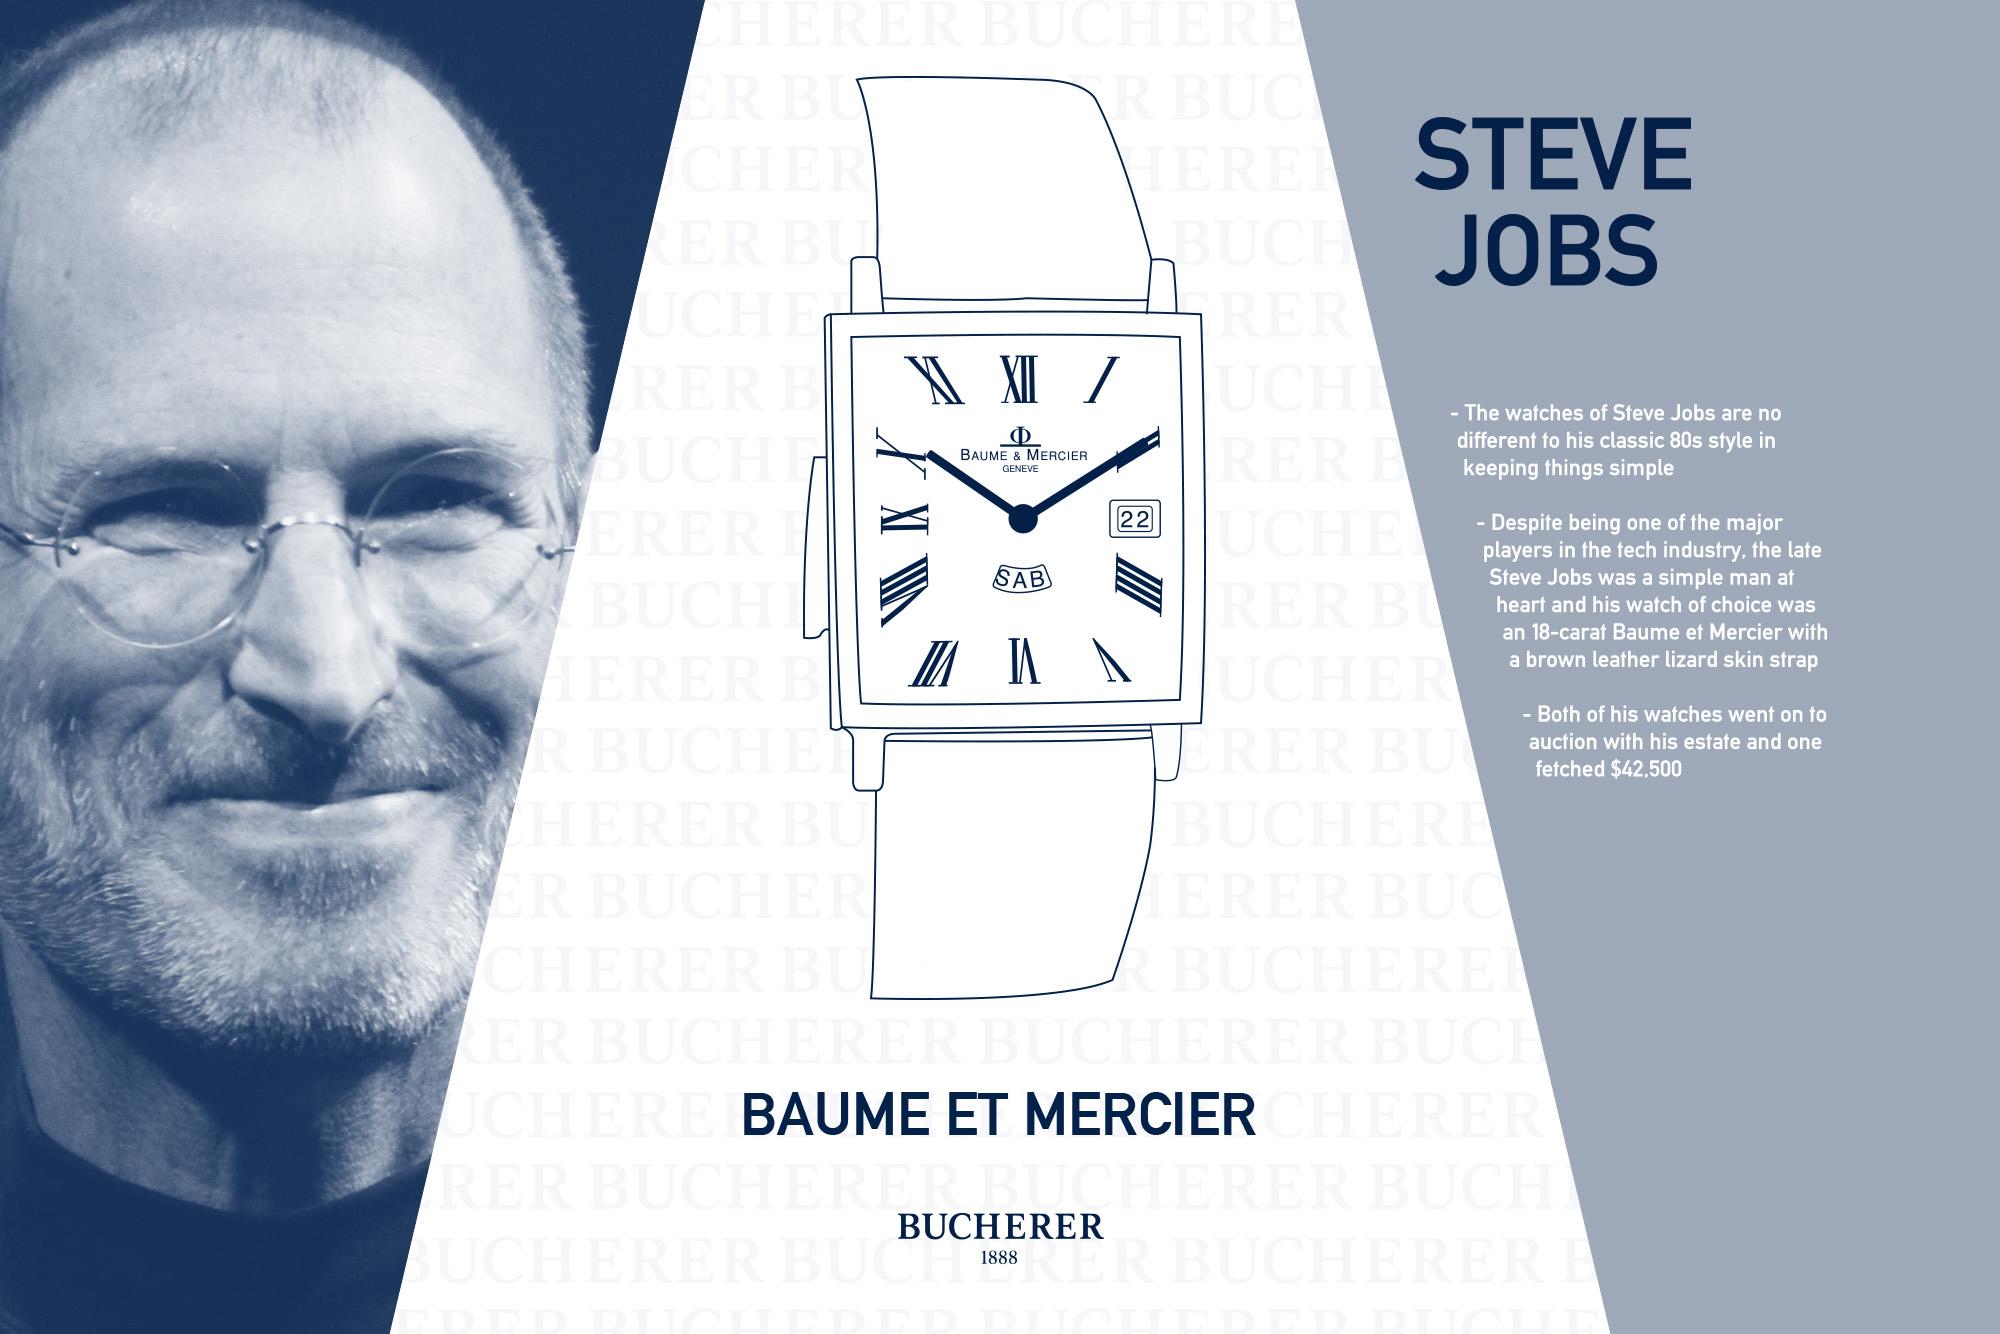 steve-jobs-and-his-baume-et-mercier-watch